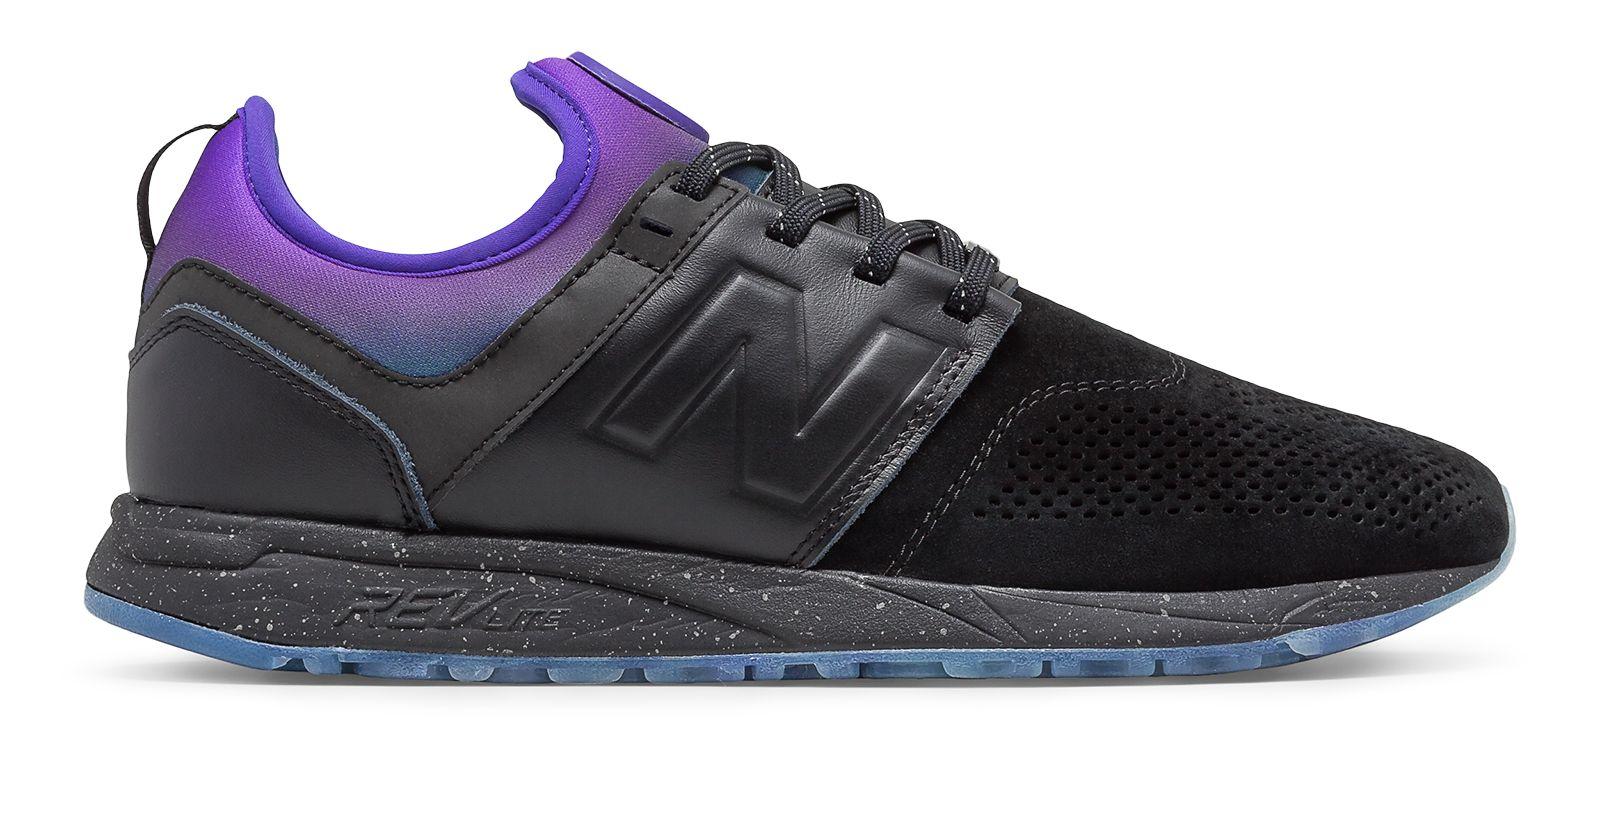 NB New Balance x Stance 247, Black with Purple